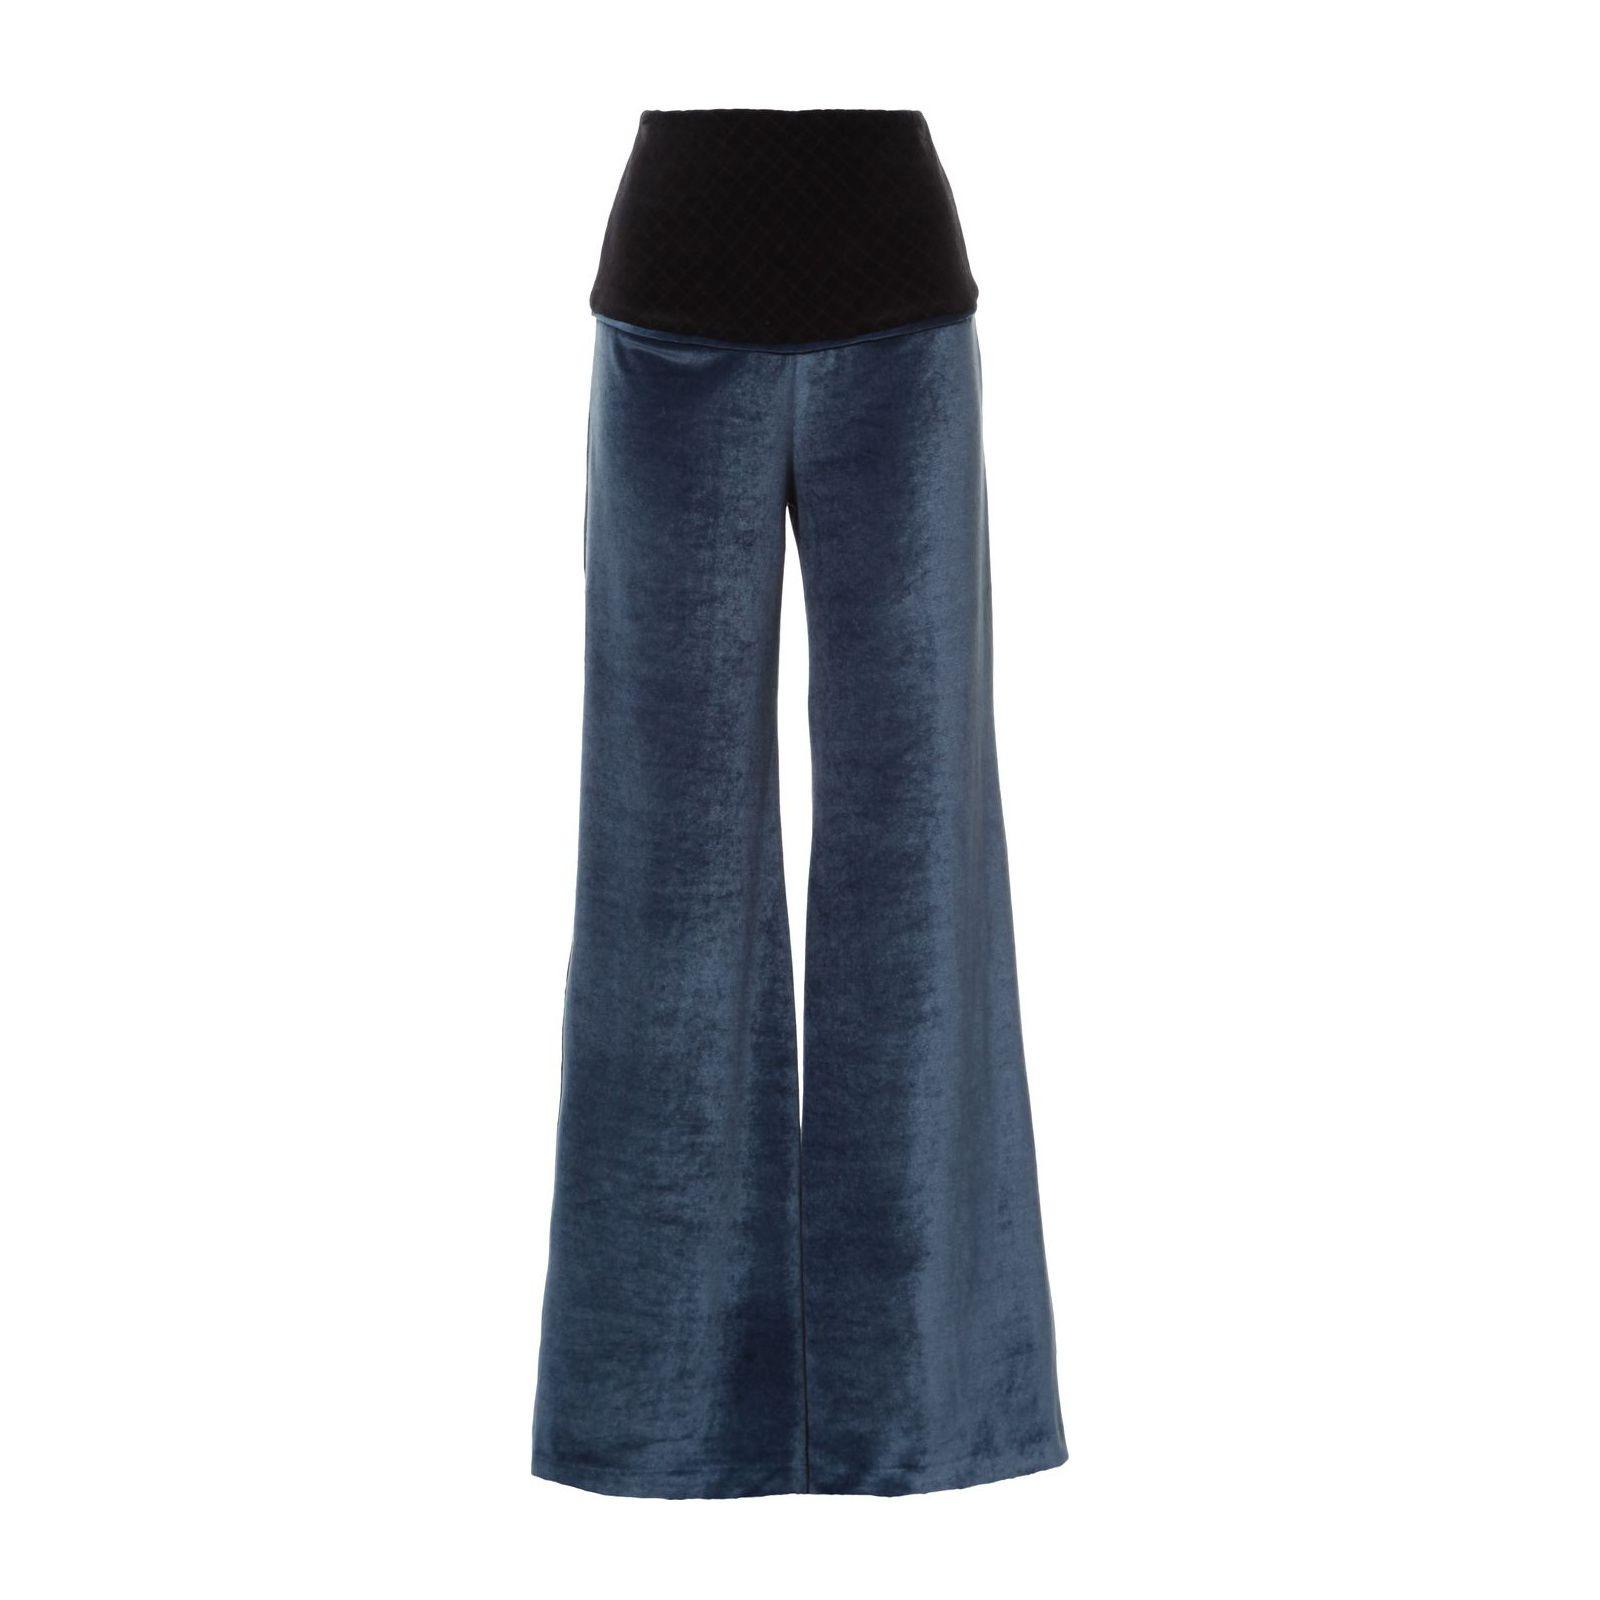 Calça Pantalona Plush - Azul